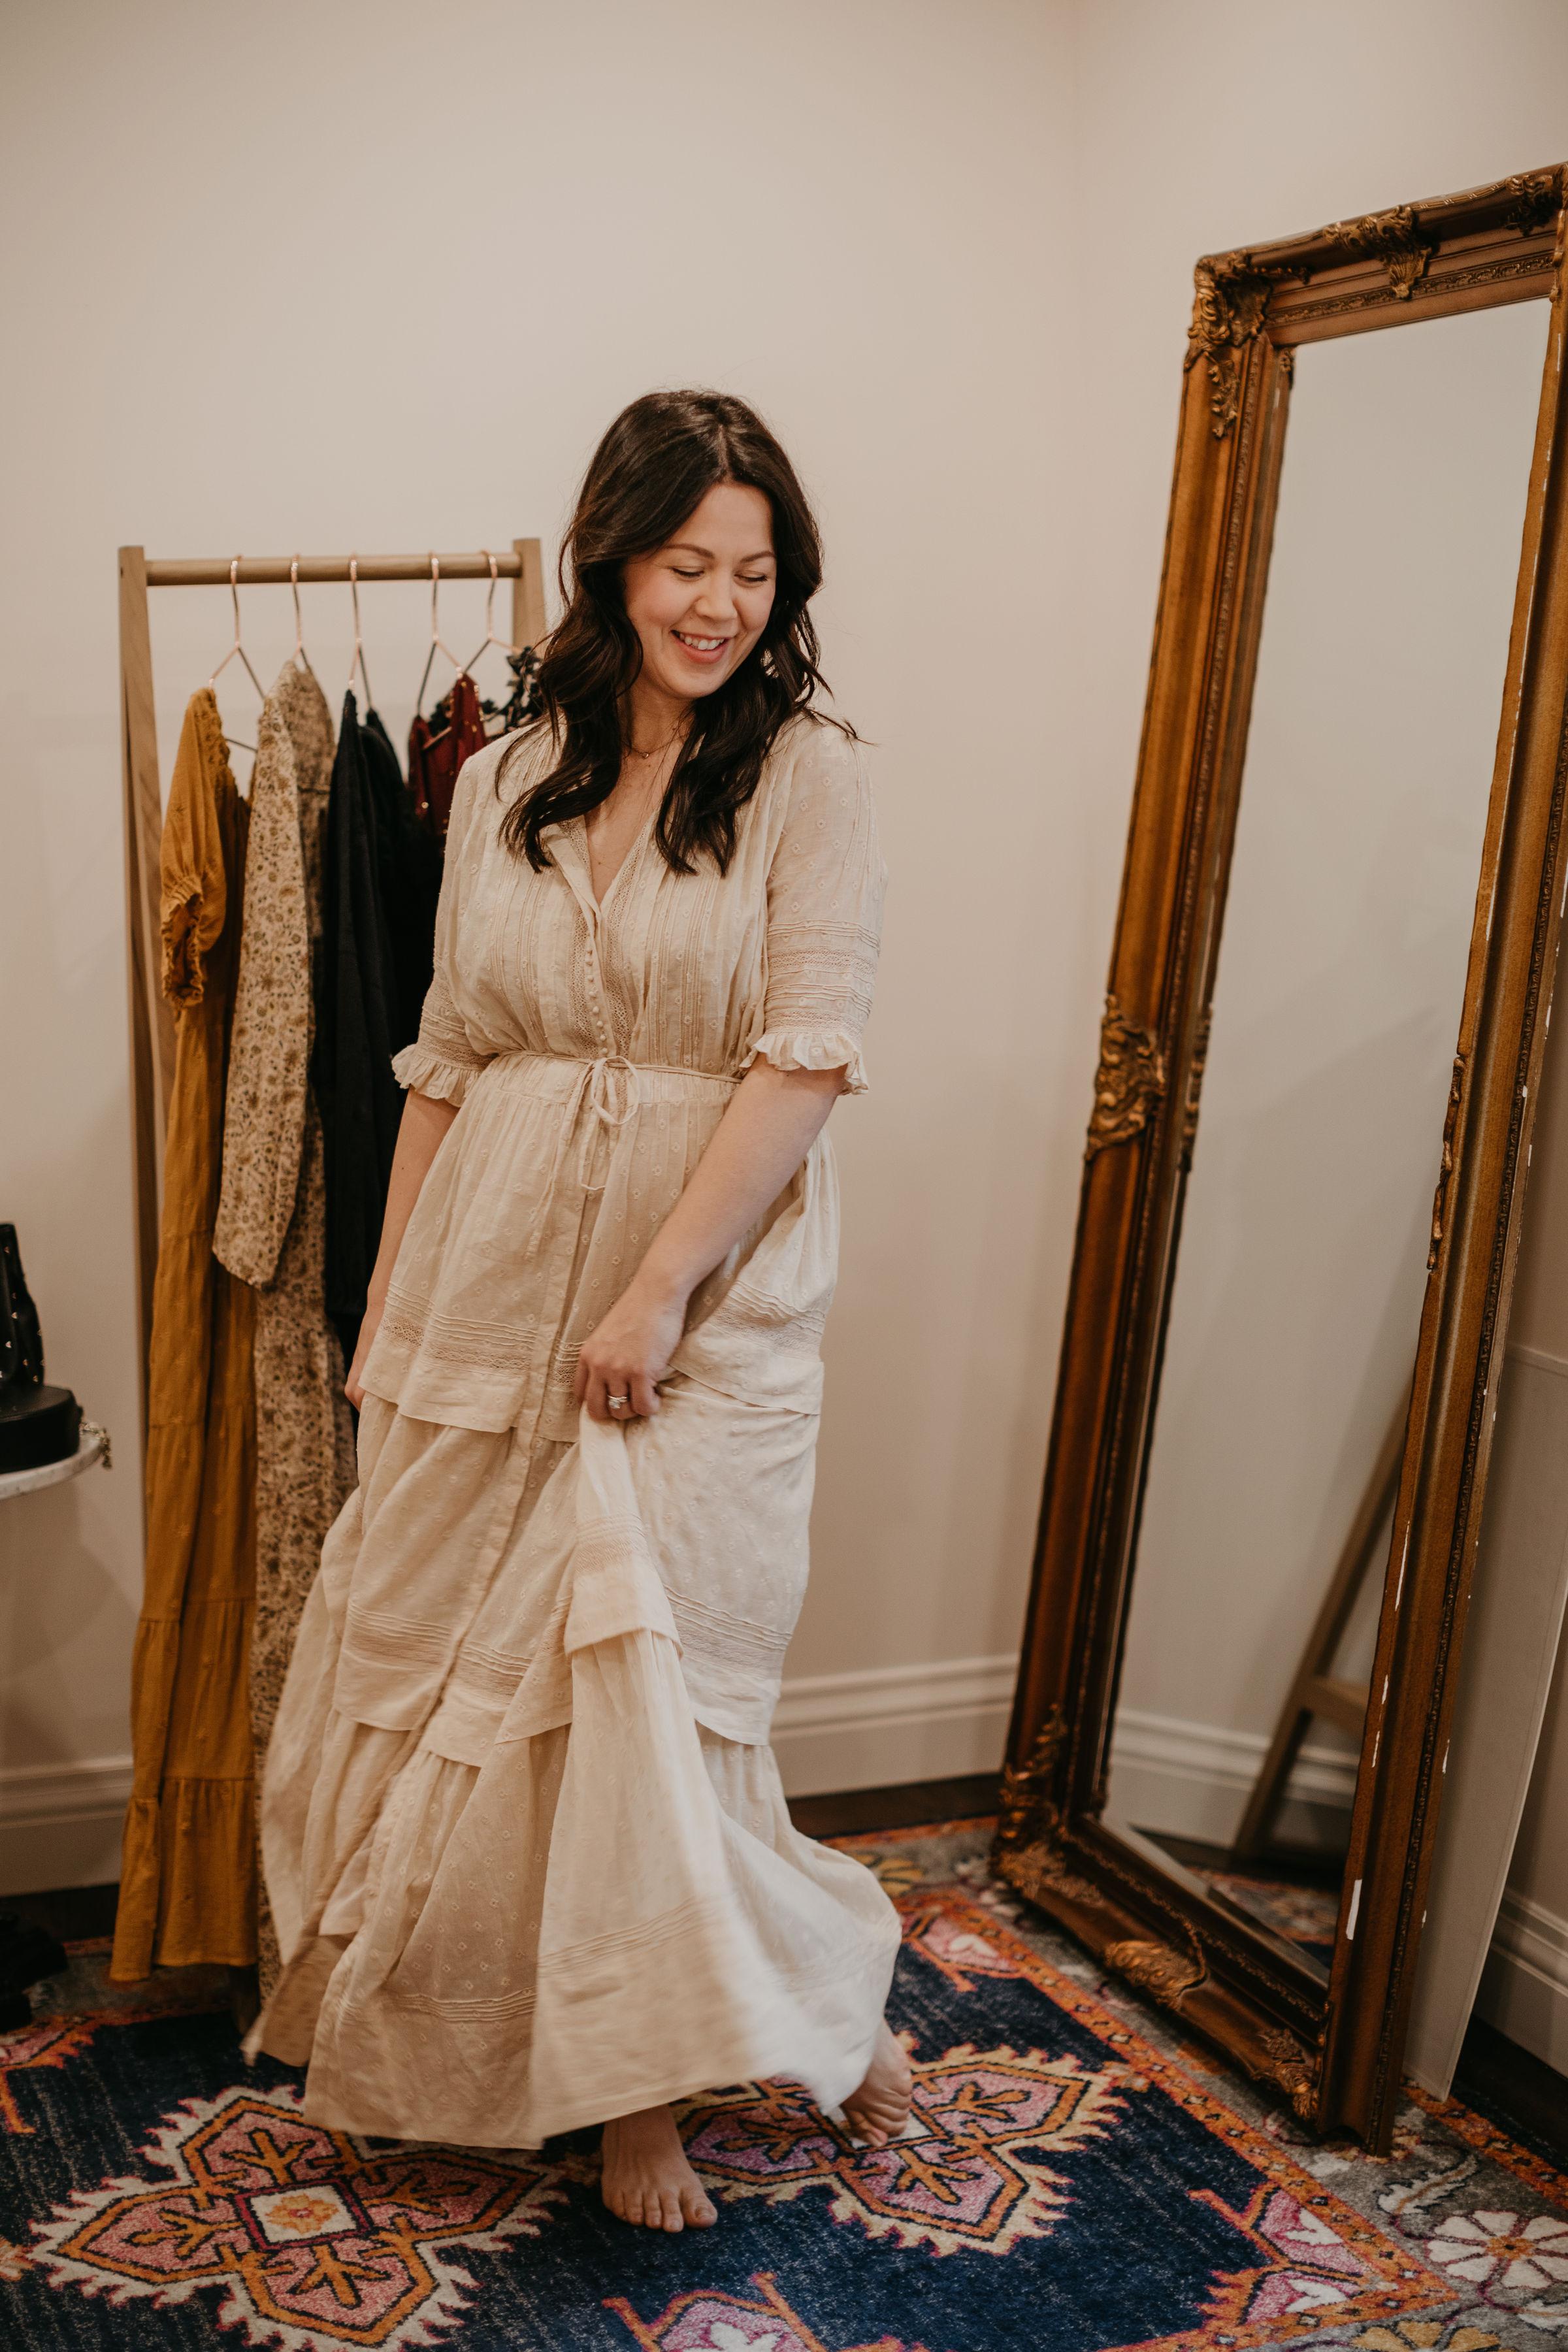 d84135b708d41 ... What to wear when you're pregnant | Dôen Primrose Dress, baby-bump